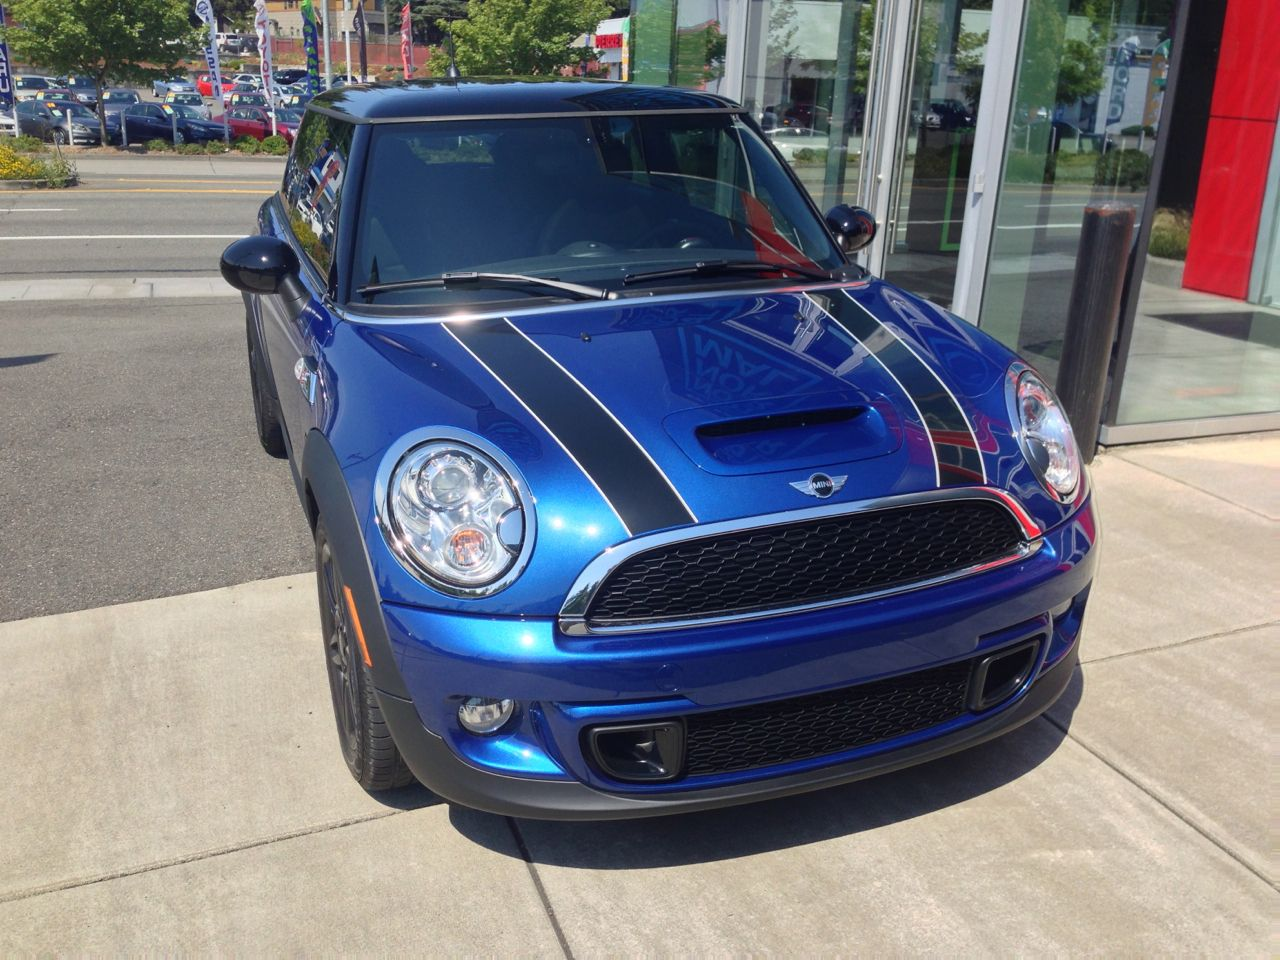 Mini Cooper S Hardtop Lightning Blue Metallic Blue Mini Cooper Mini Cooper Hardtop Mini Cooper